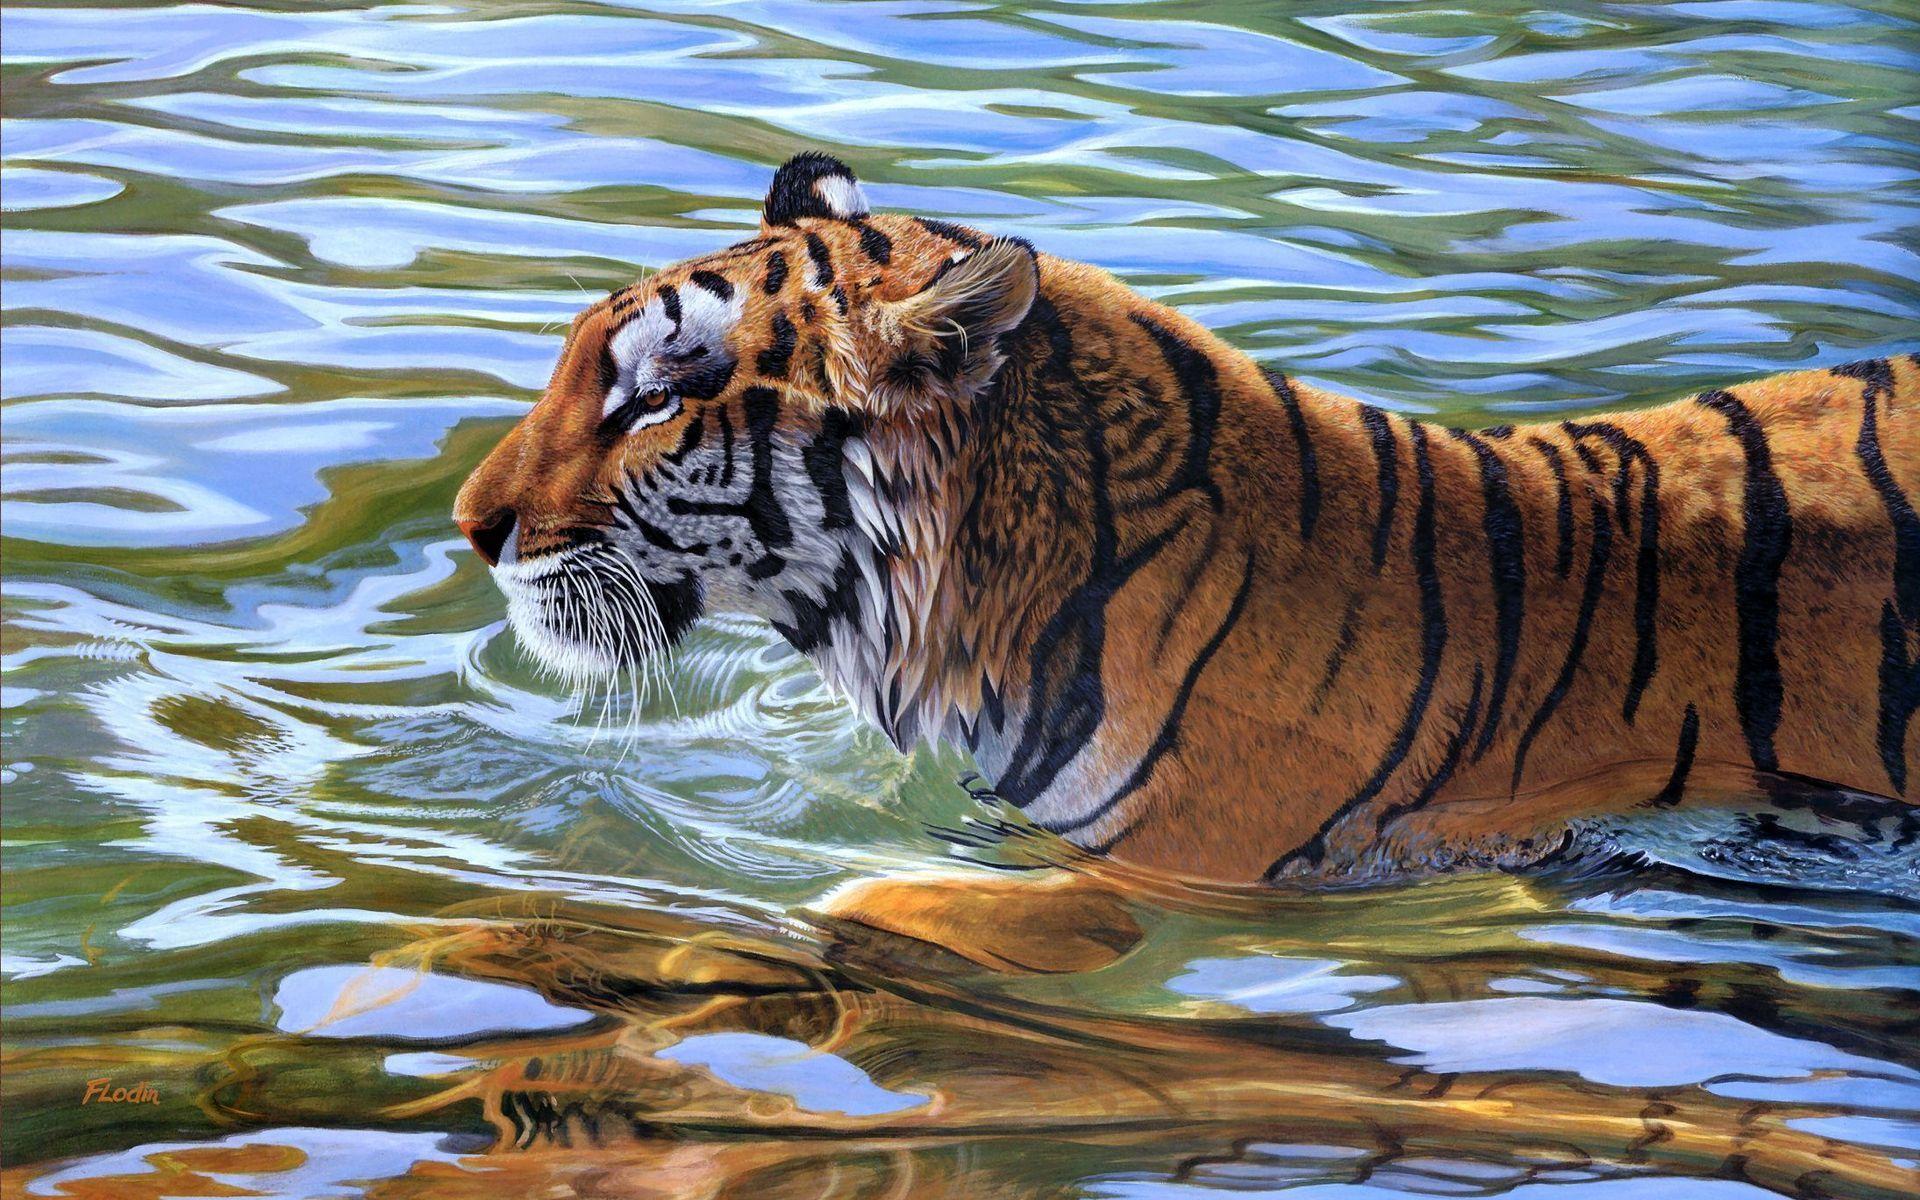 wallpaper animado,tiger,vertebrate,wildlife,bengal tiger,mammal